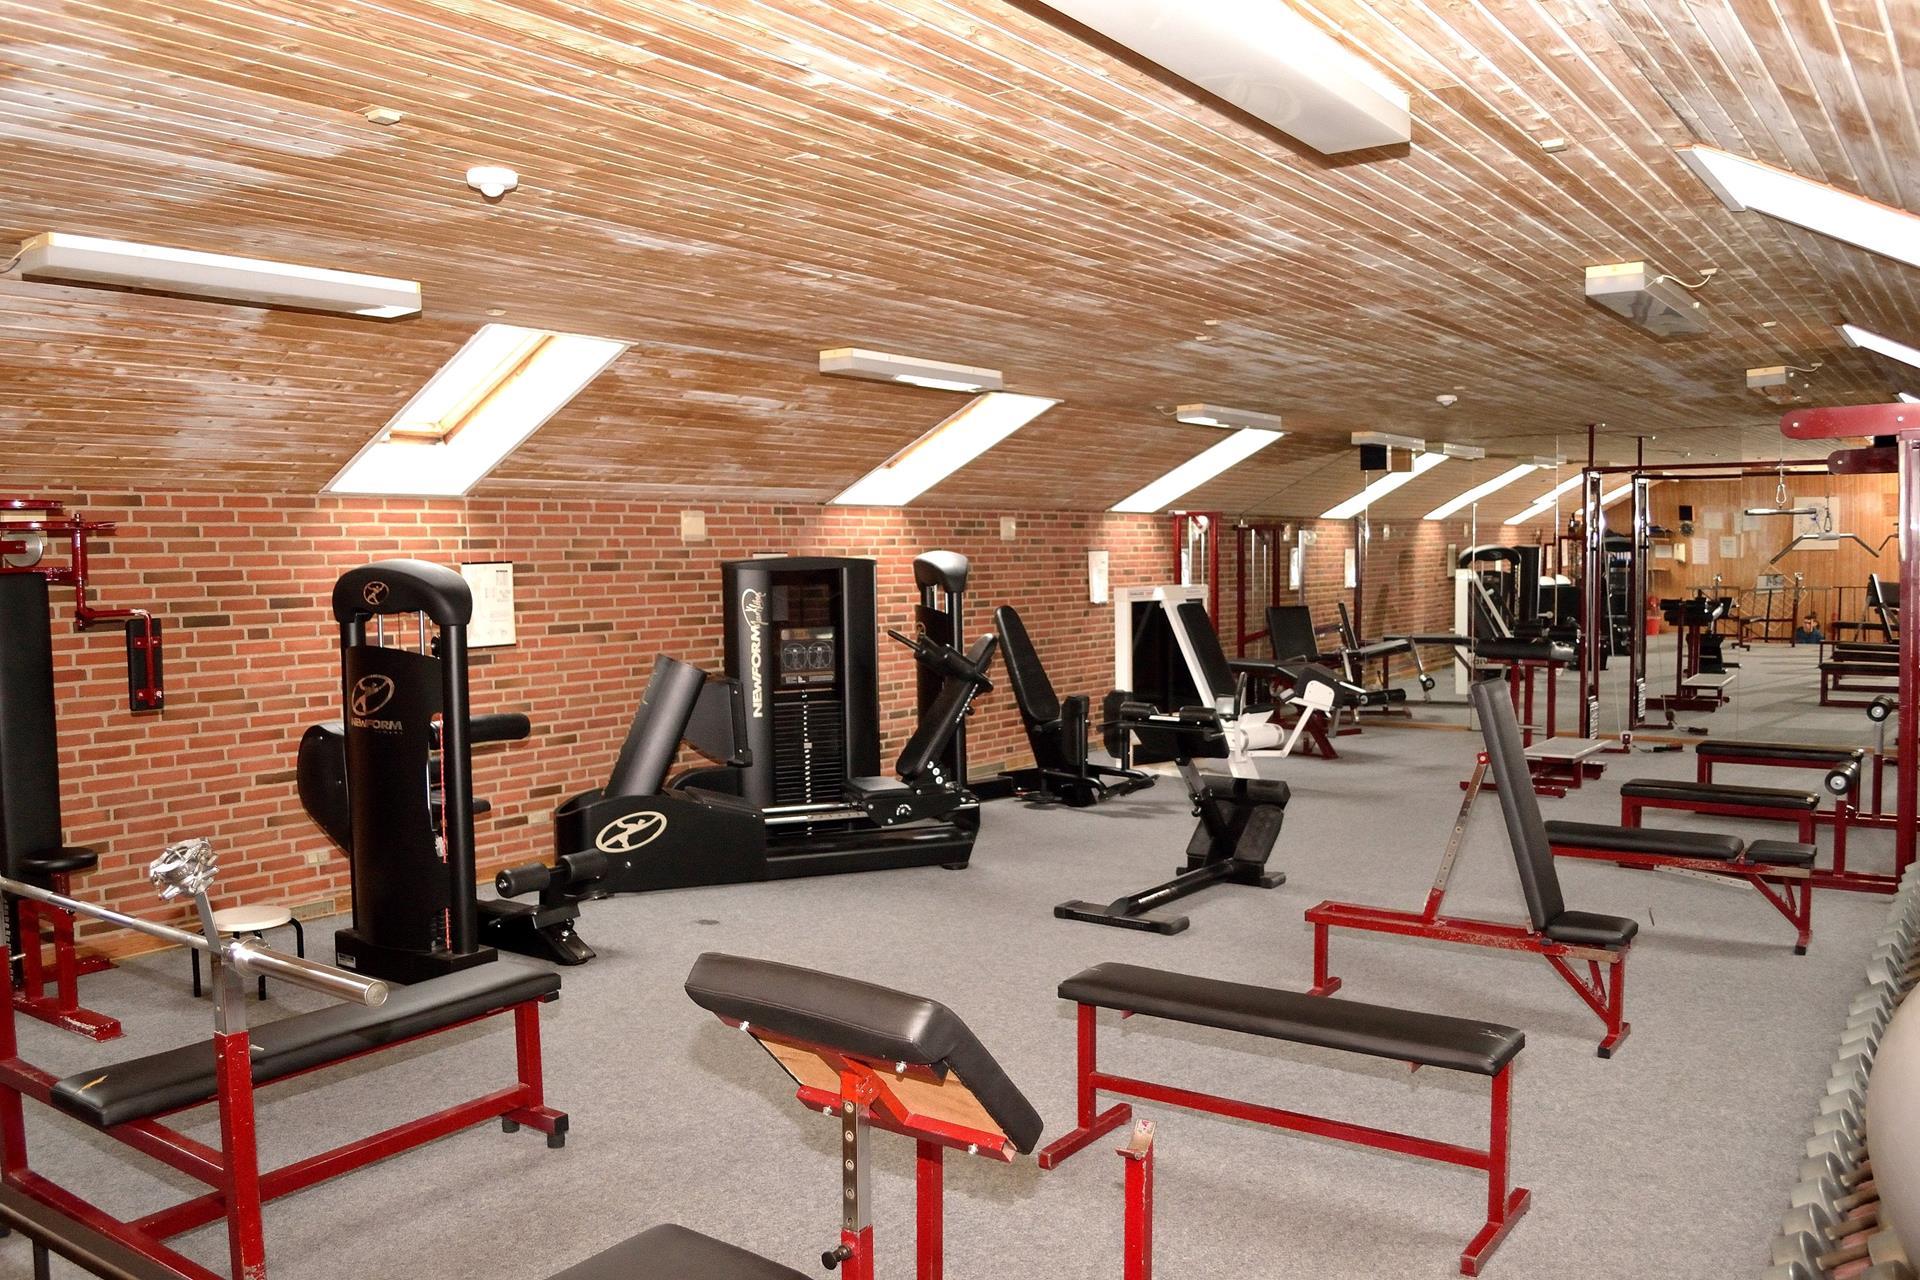 Bolig/erhverv på Augustenborg Landevej i Sønderborg - Fitness lokale